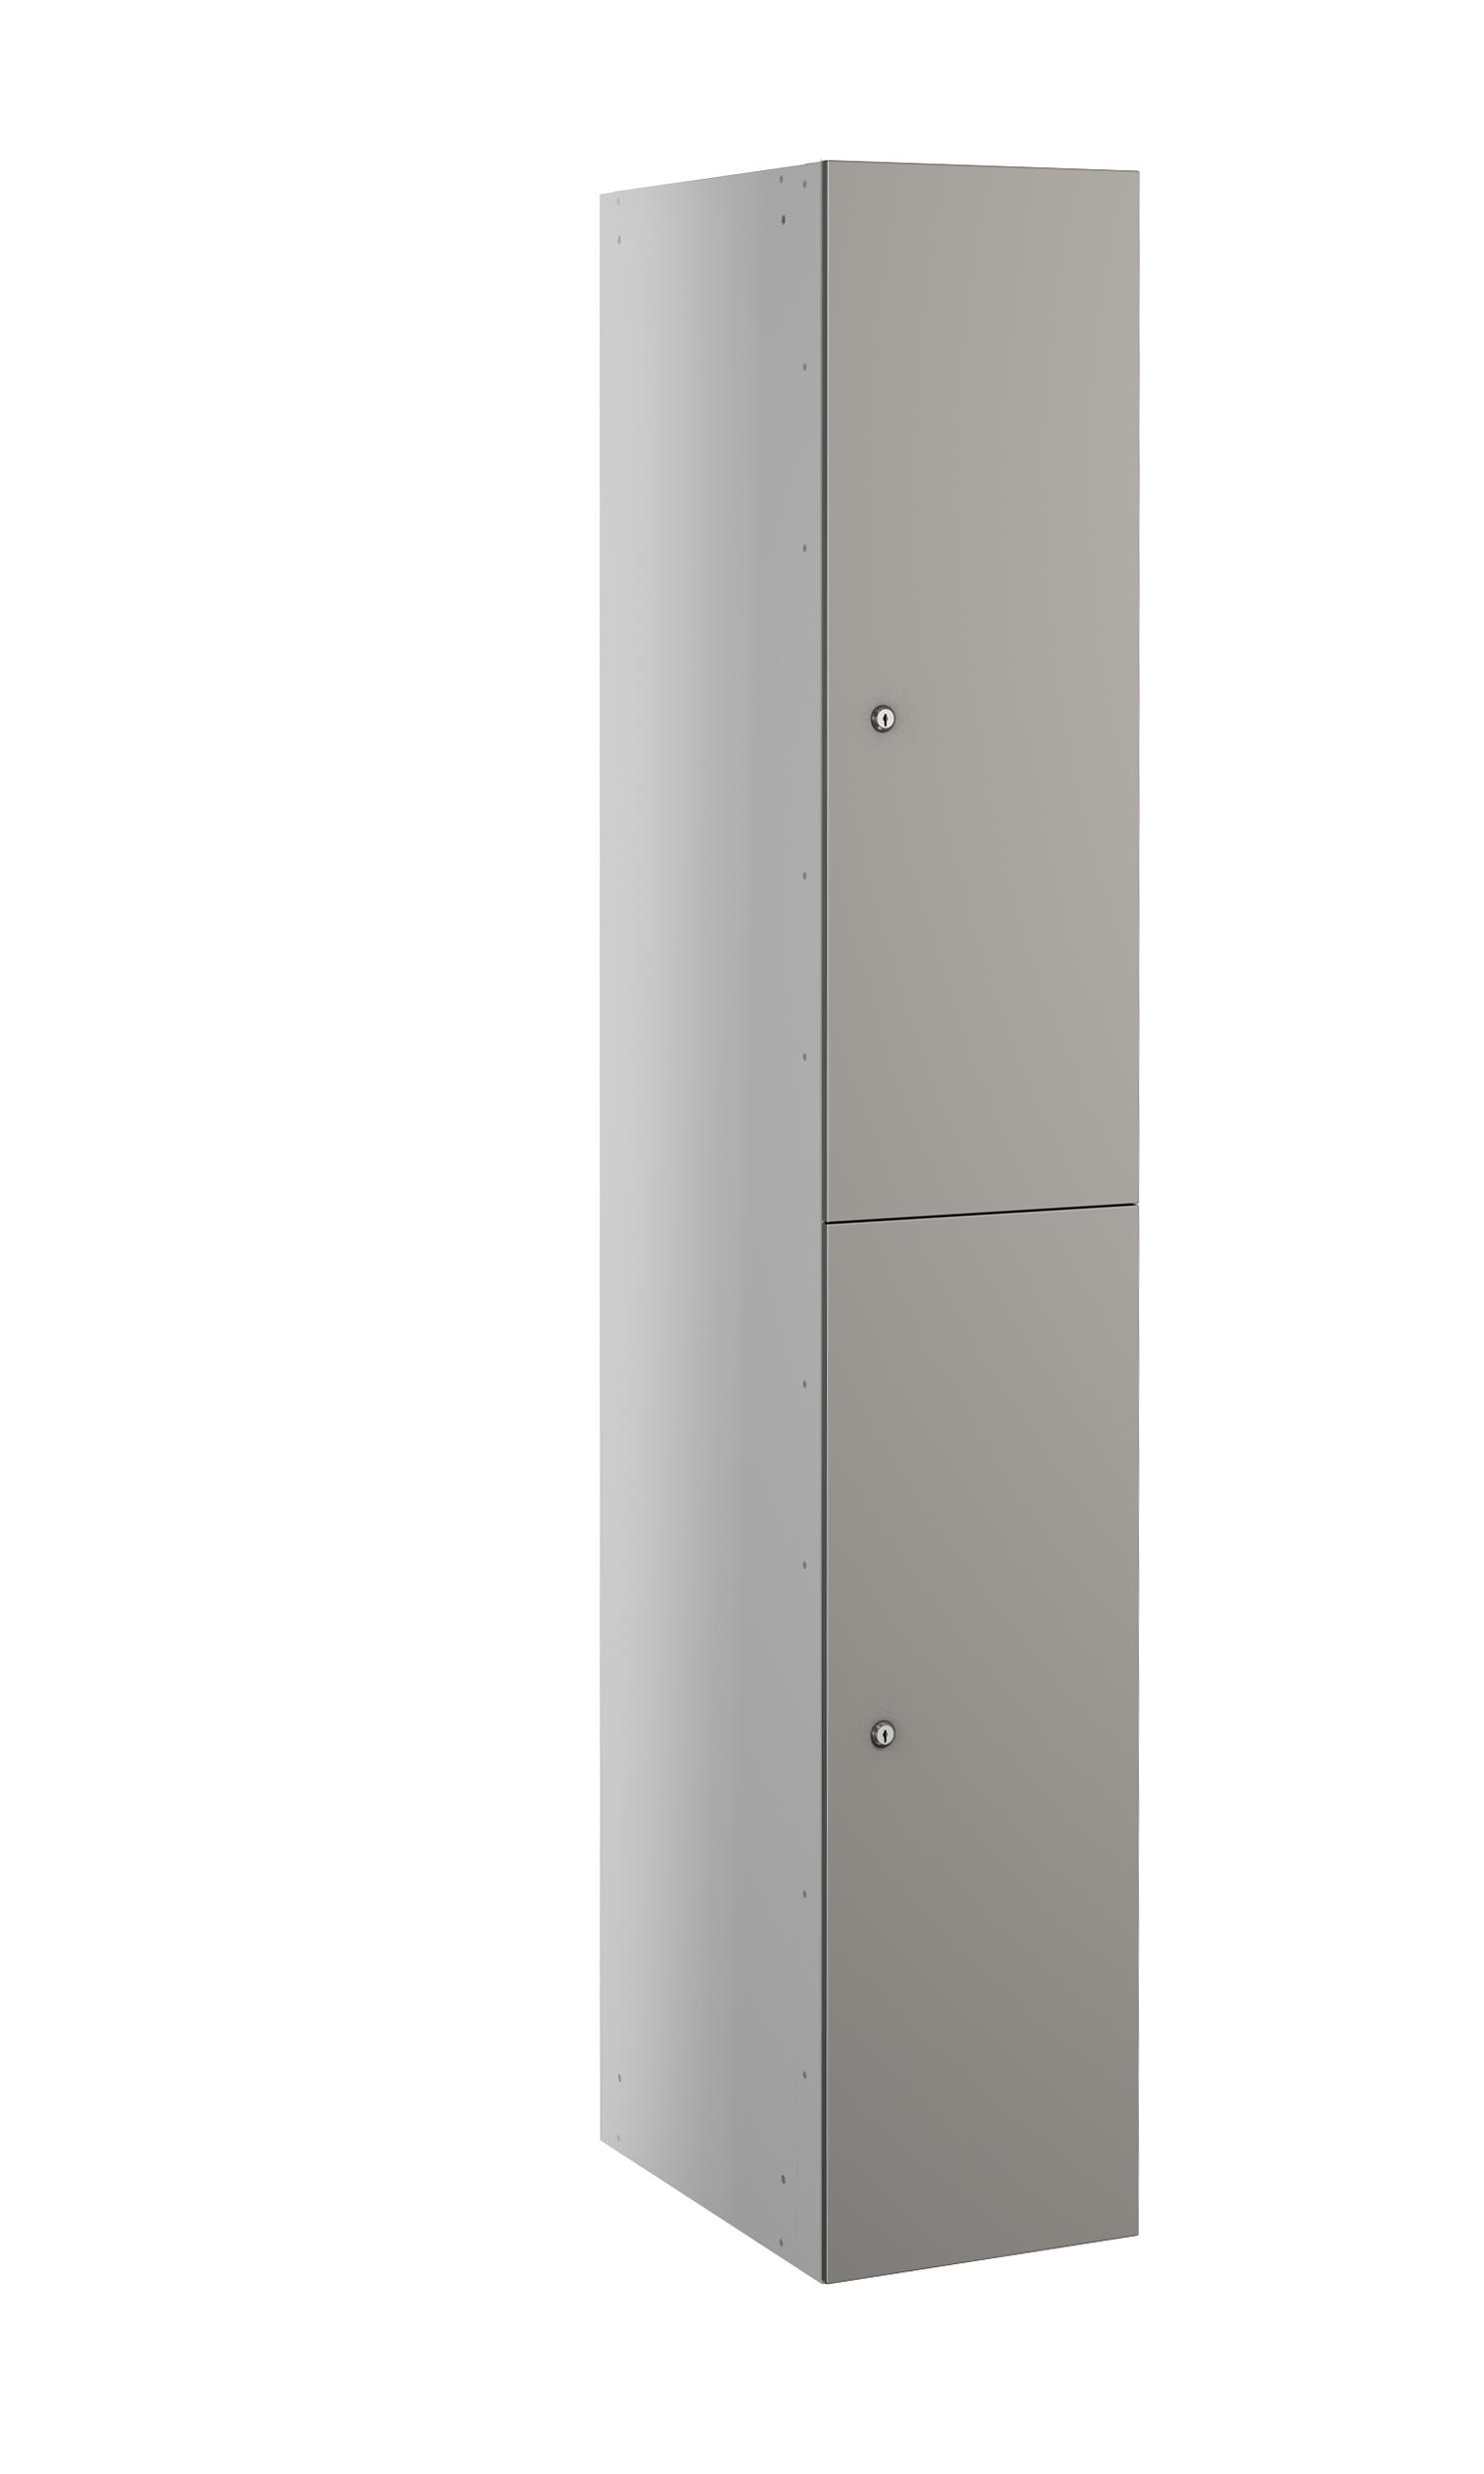 Probe buzzbox laminate 2 doors grey